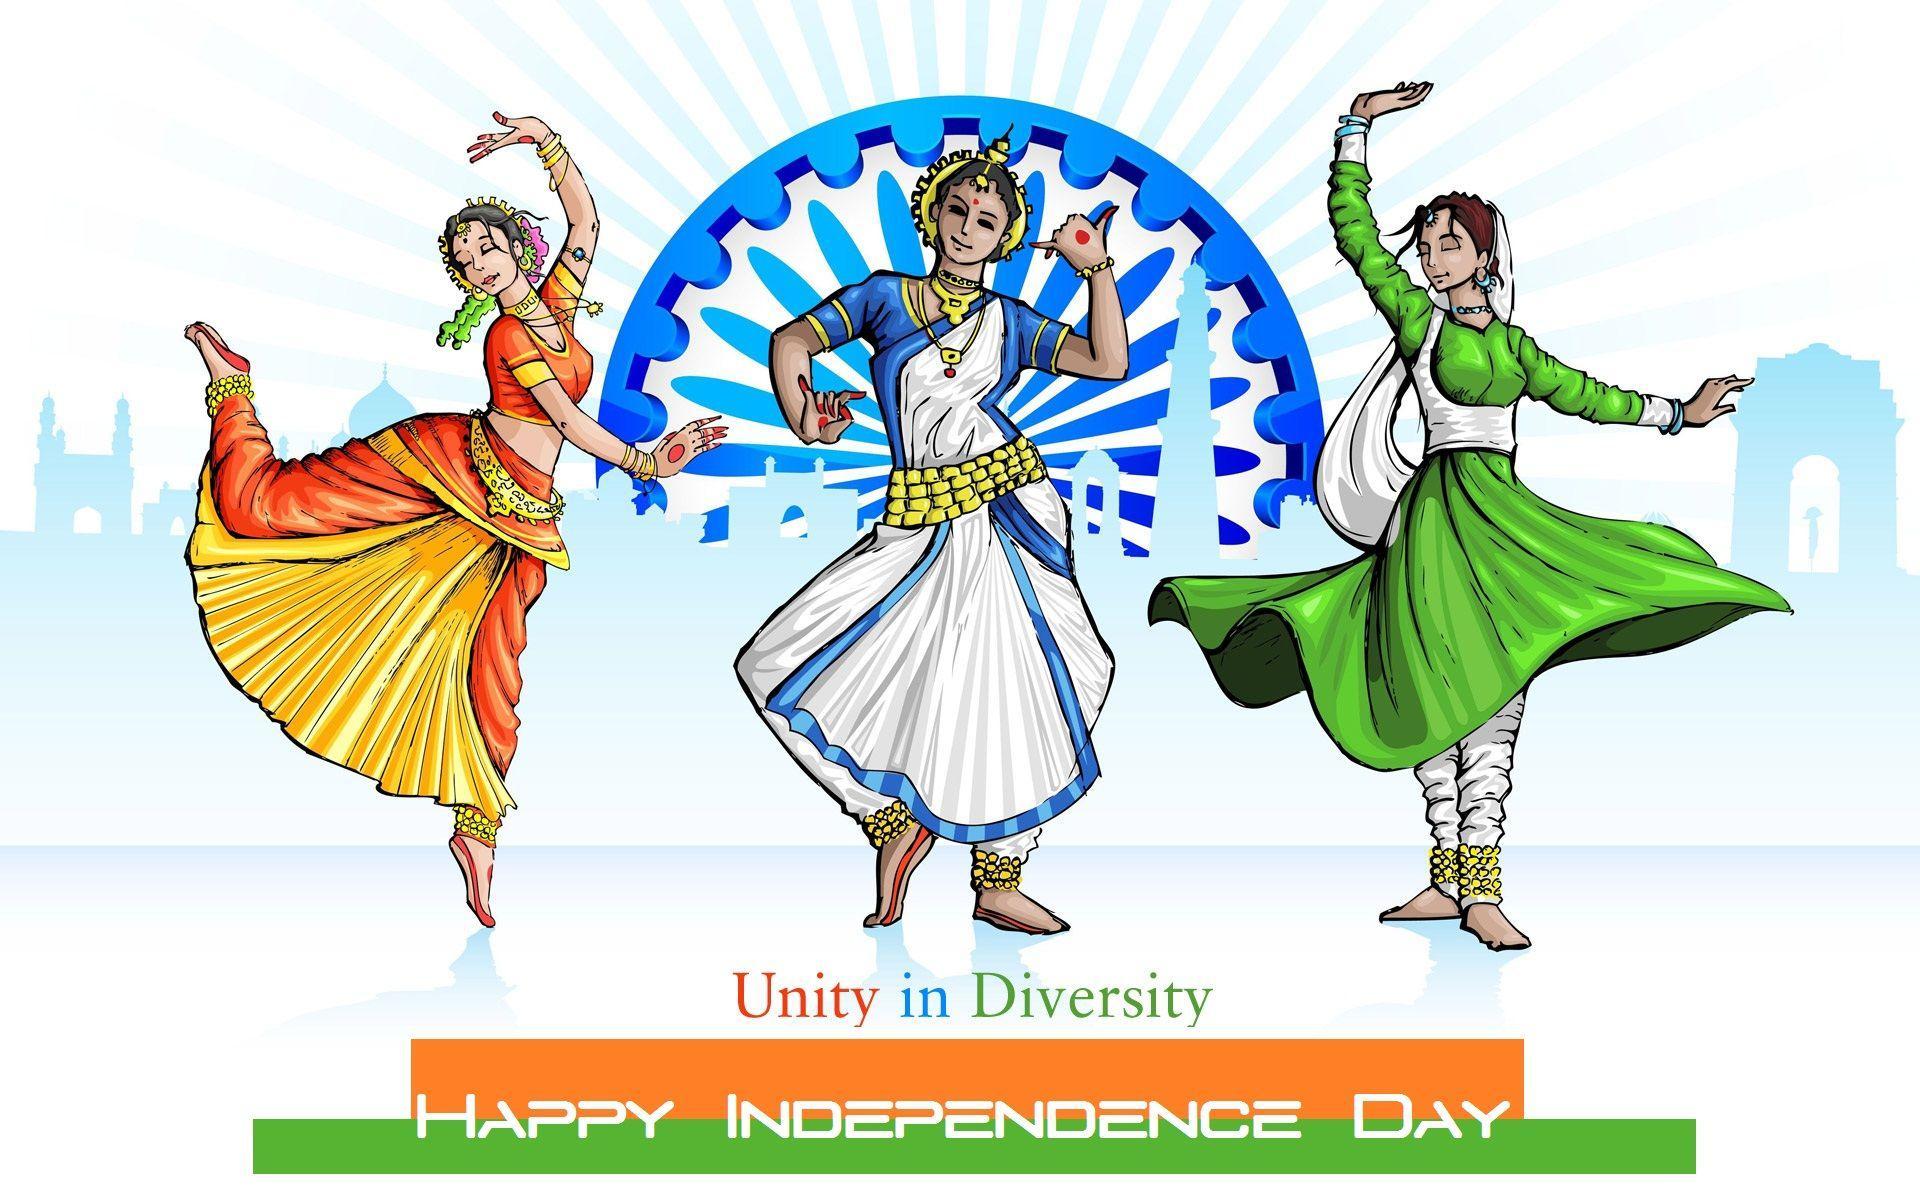 Indian Dance Cartoon Wallpapers Top Free Indian Dance Cartoon Backgrounds Wallpaperaccess